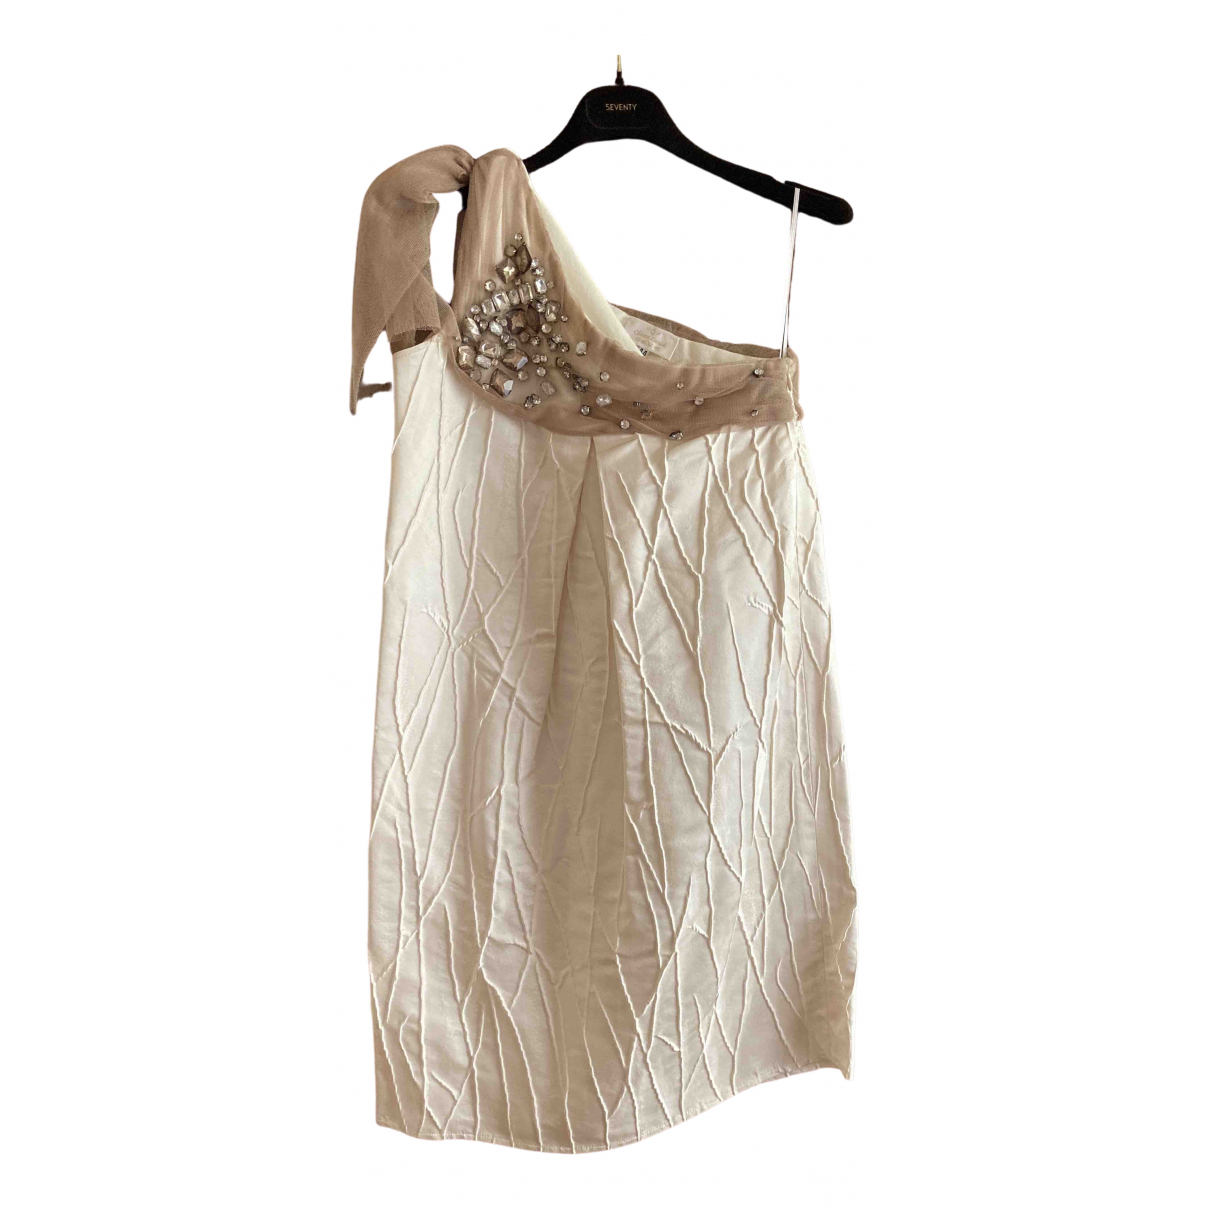 Chicca Lualdi Beequeen \N Kleid in  Weiss Seide